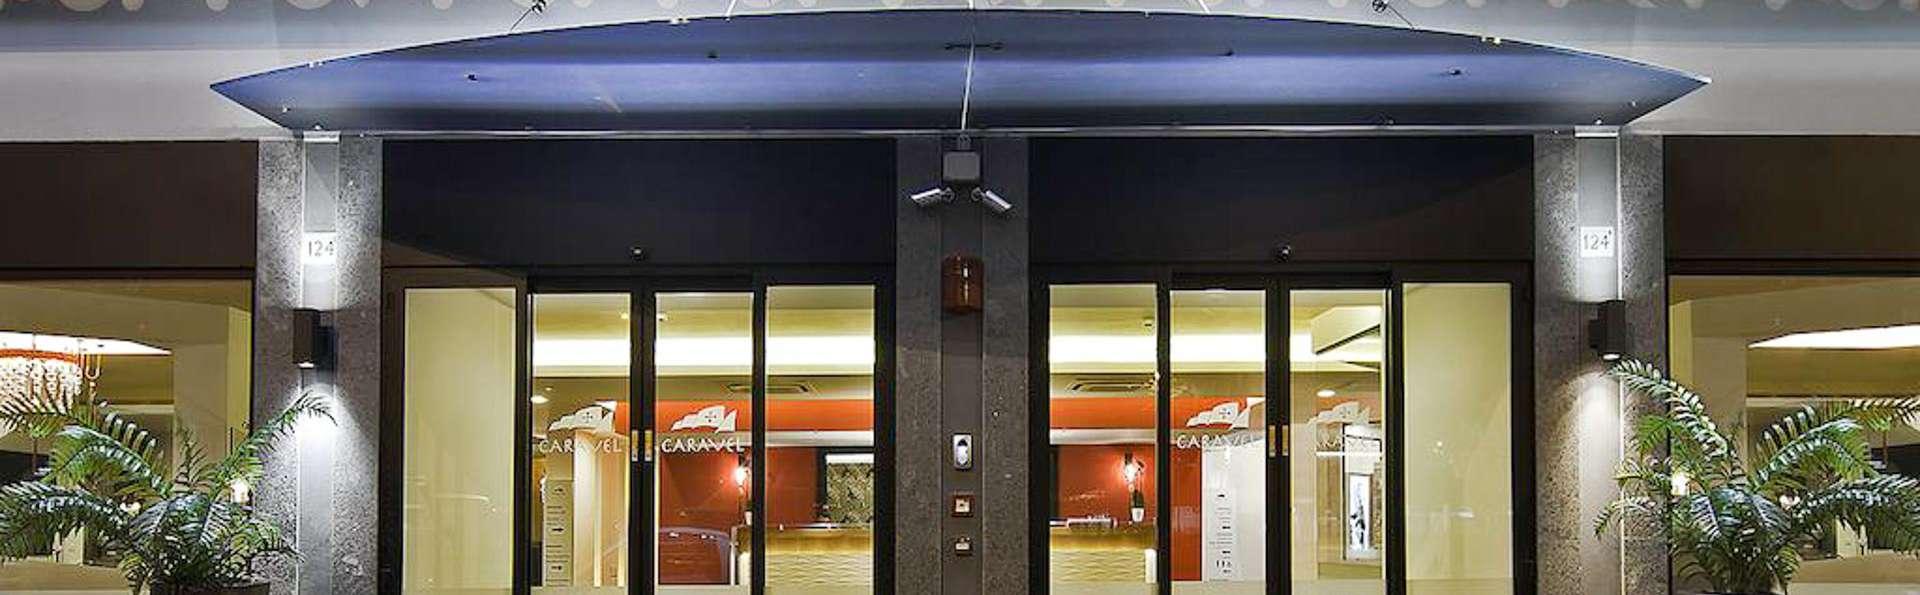 Caravel Hotel  - EDIT_FRONT_01.jpg